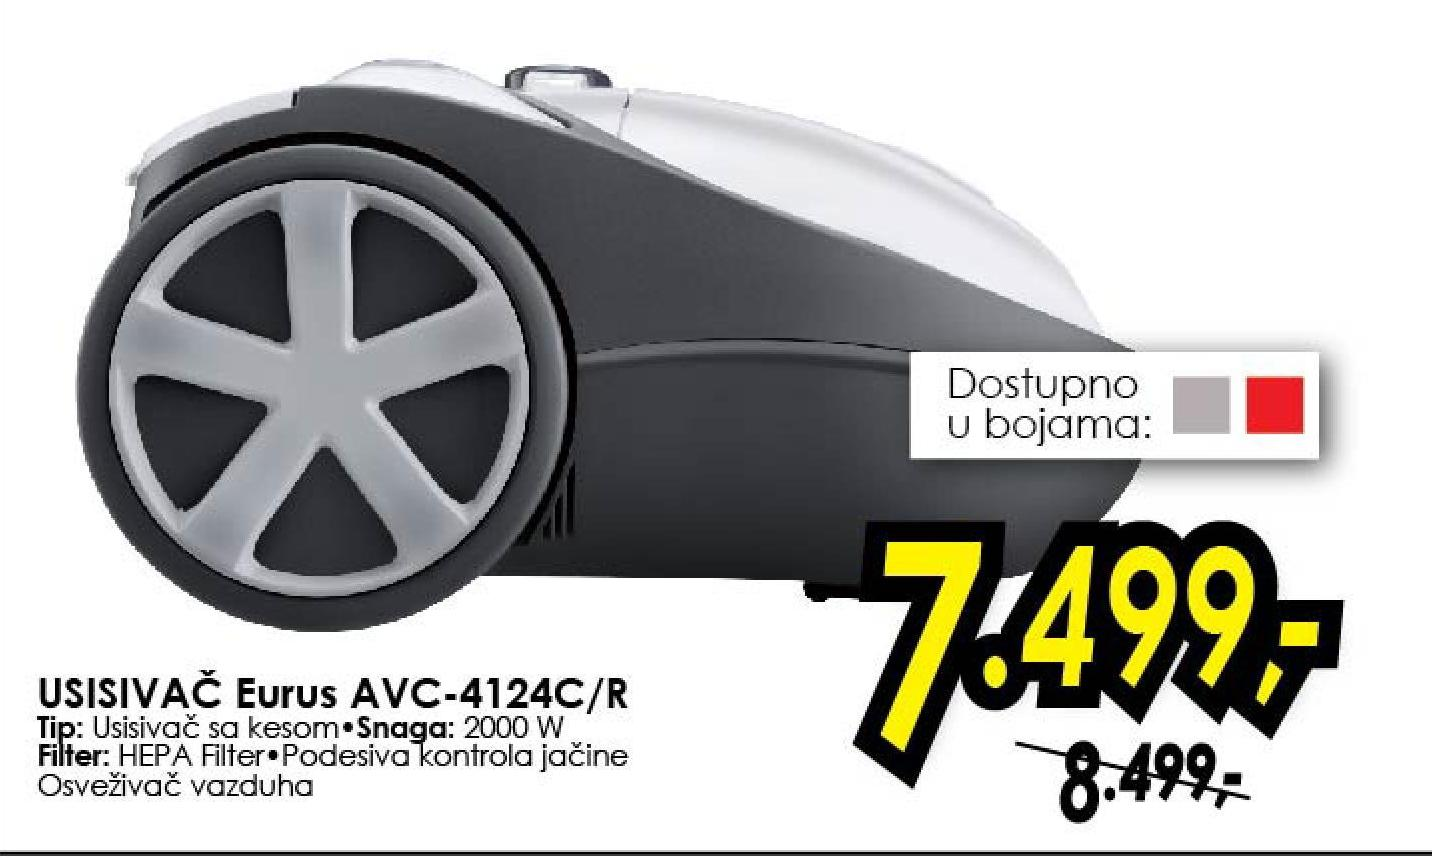 Usisivač AVC-4124C/R